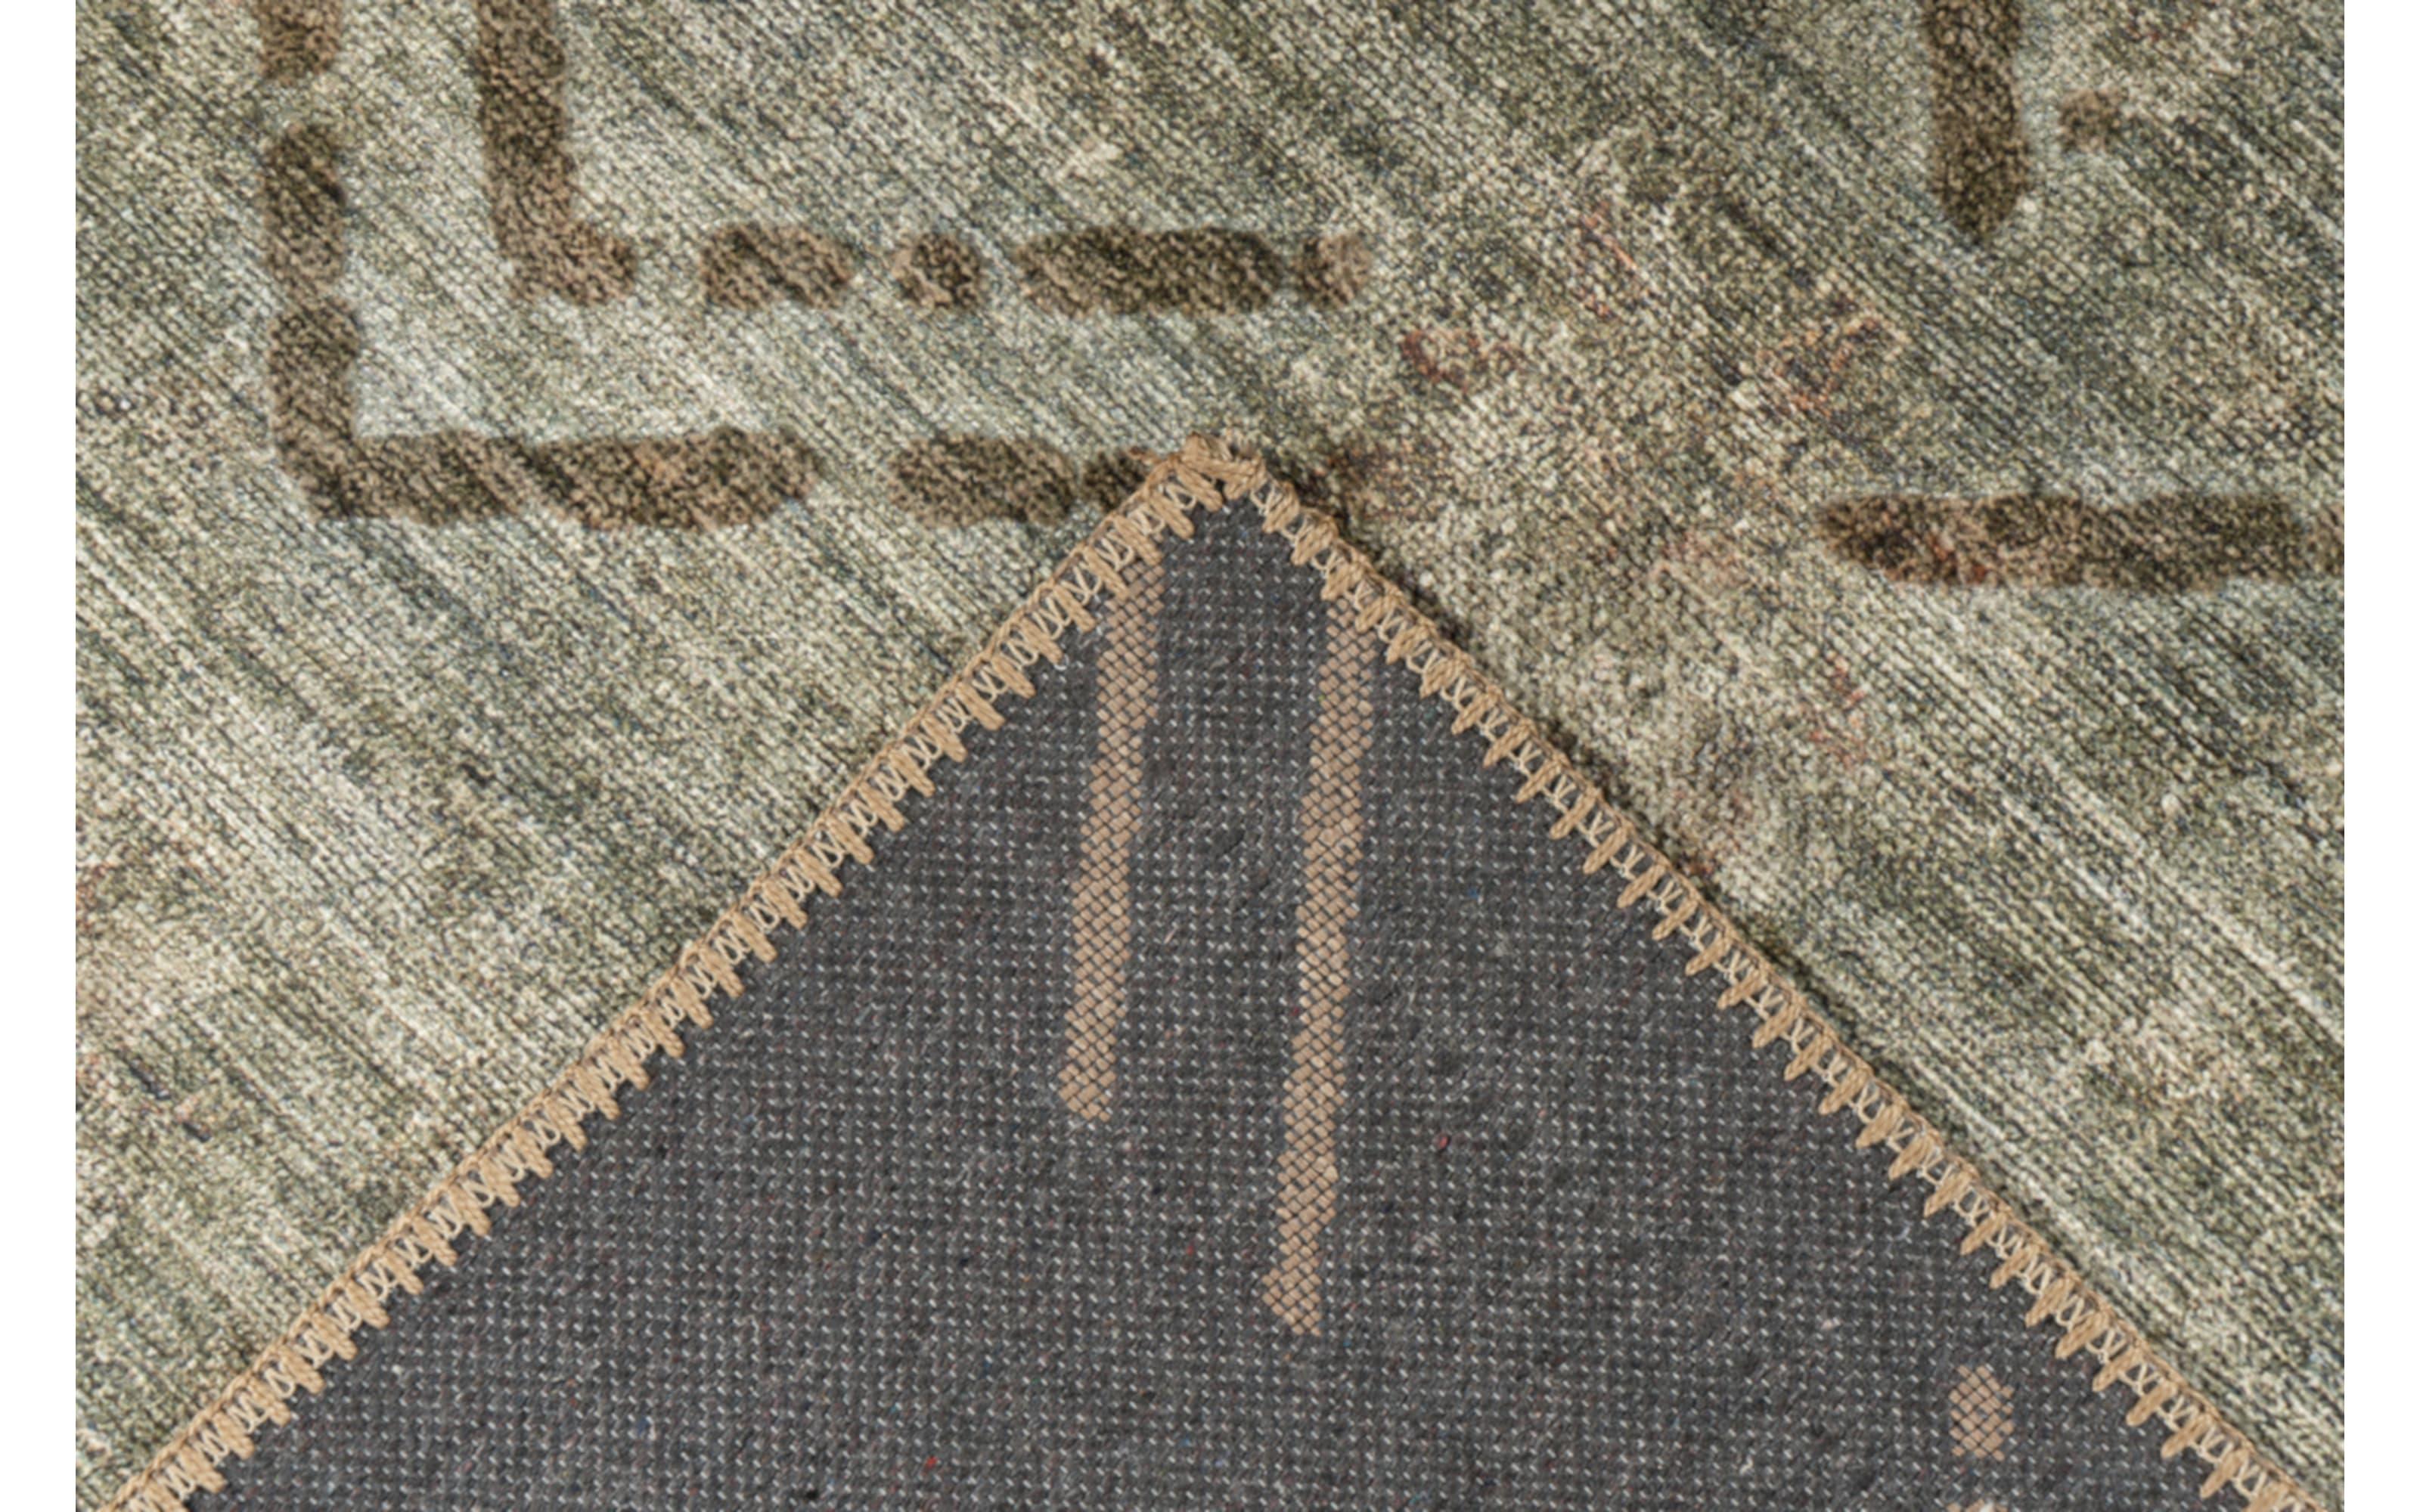 Teppich Antique 325 in khaki, 120 x 180 cm